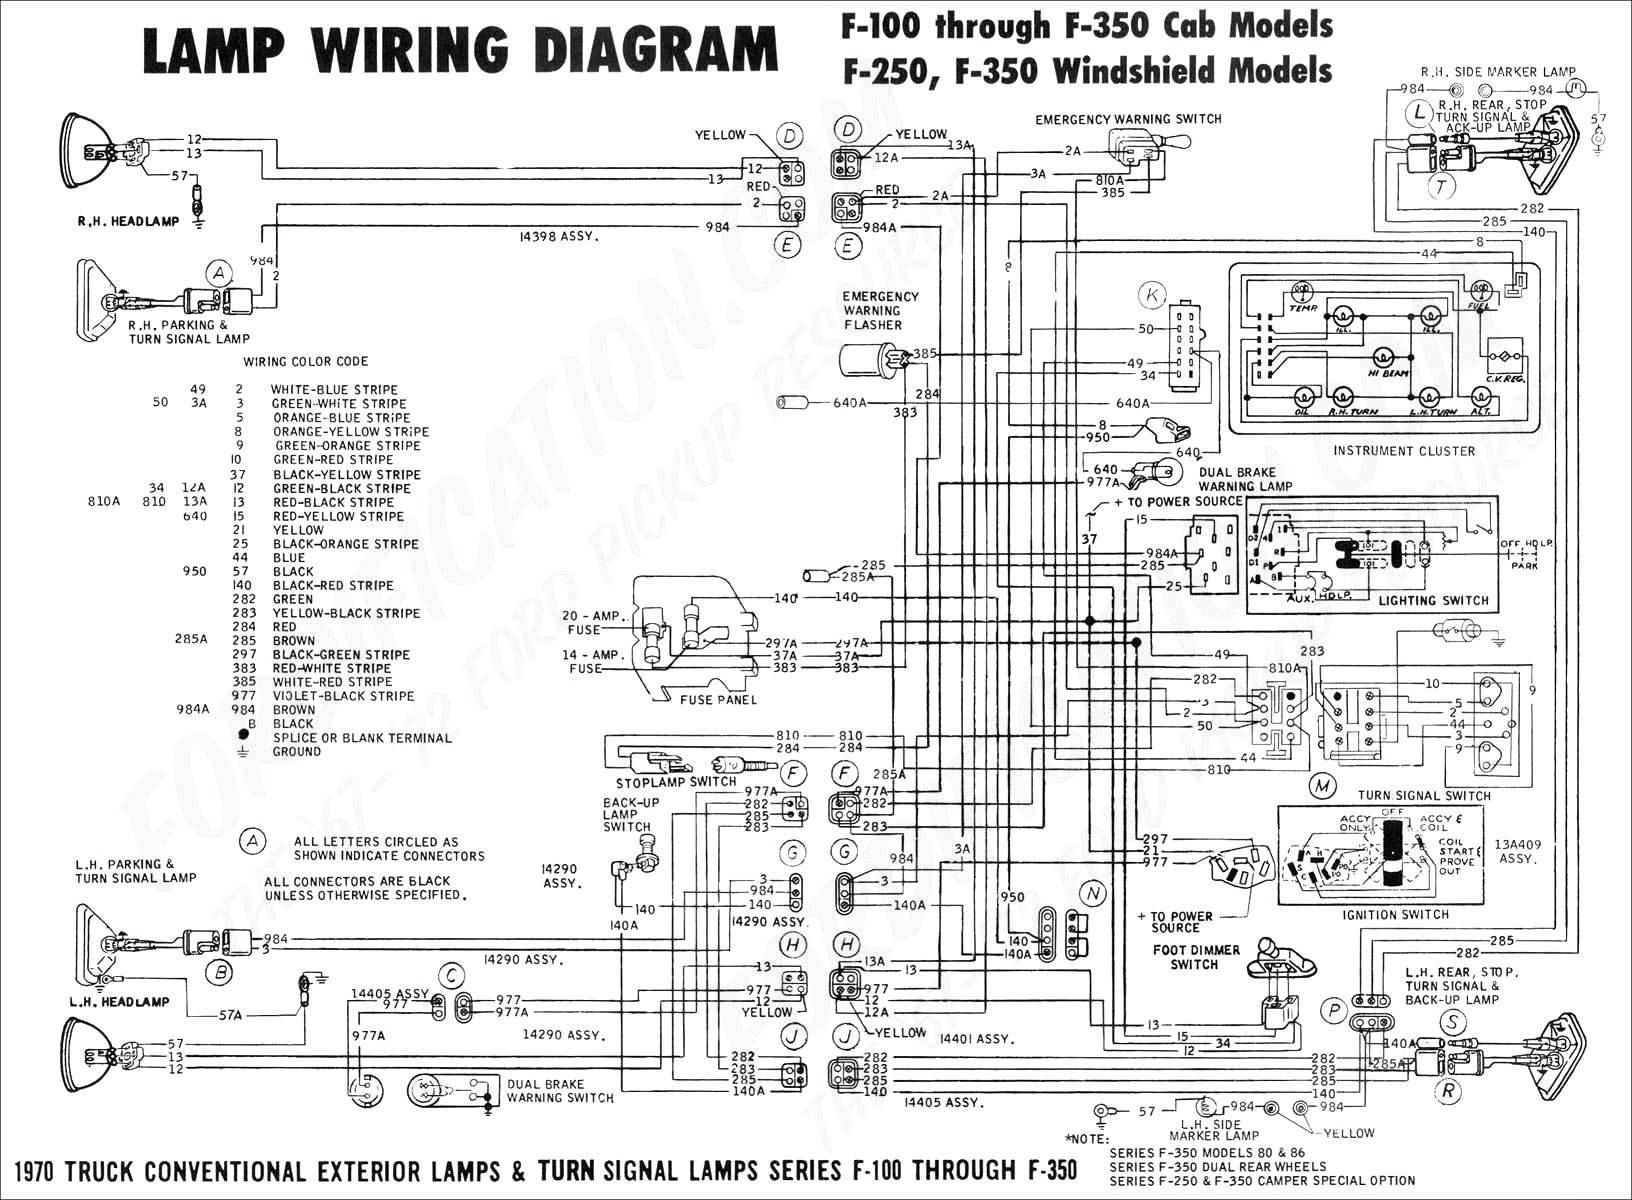 chevrolet matiz engine diagram get free image about wiring diagram